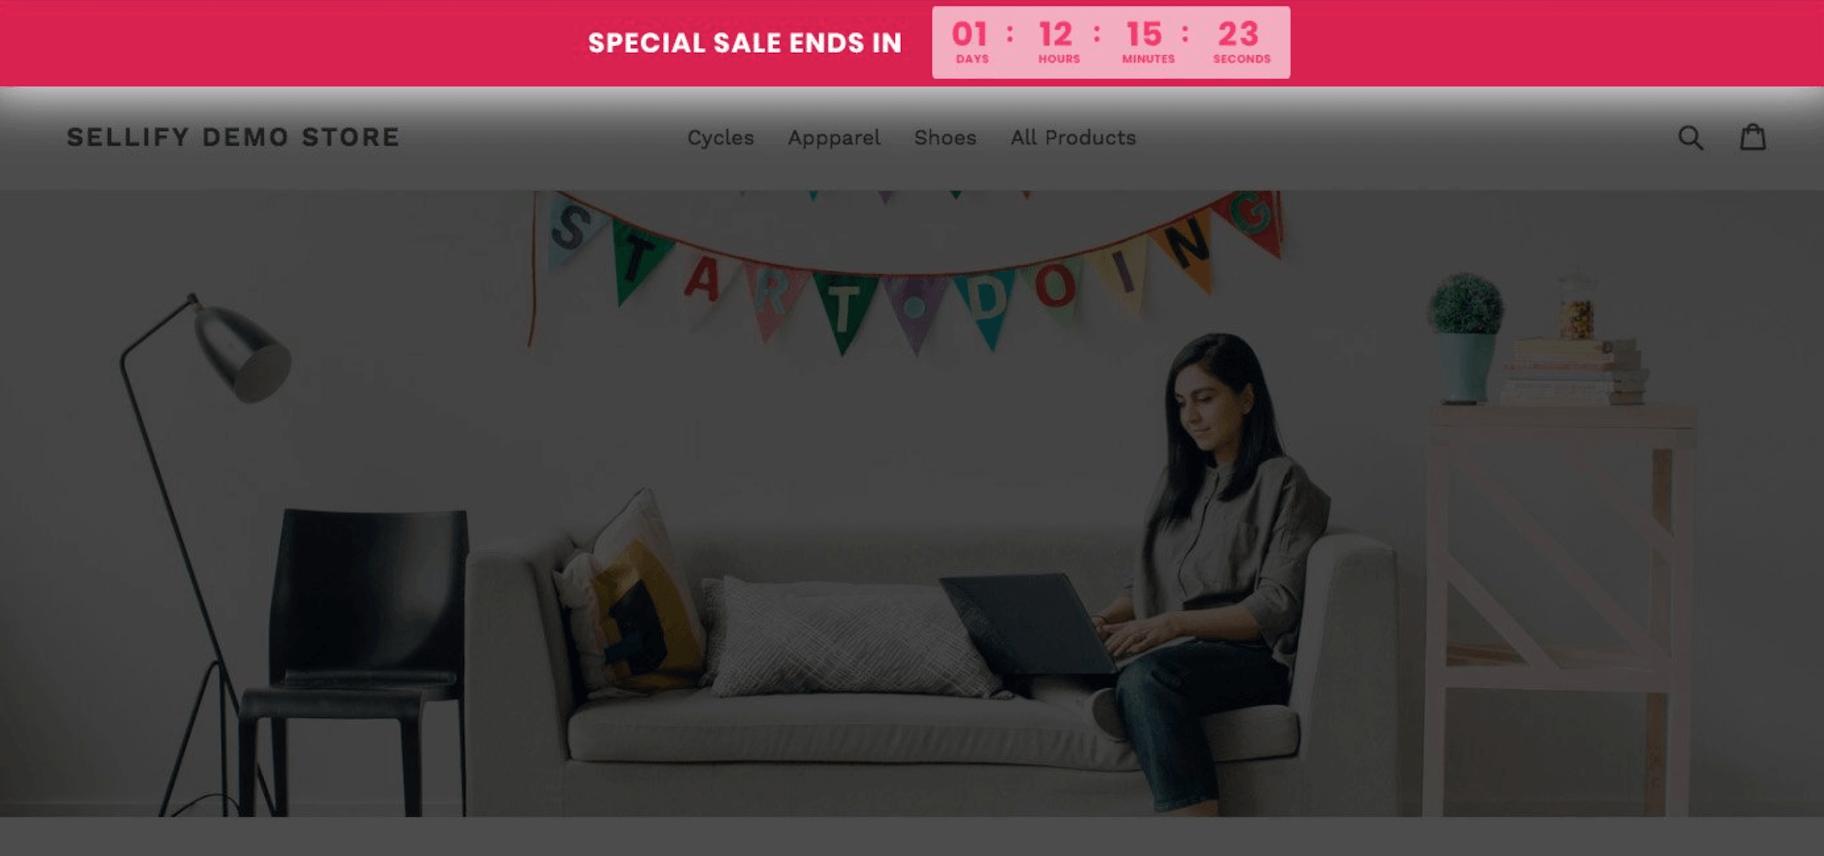 sales promotion strategies countdown